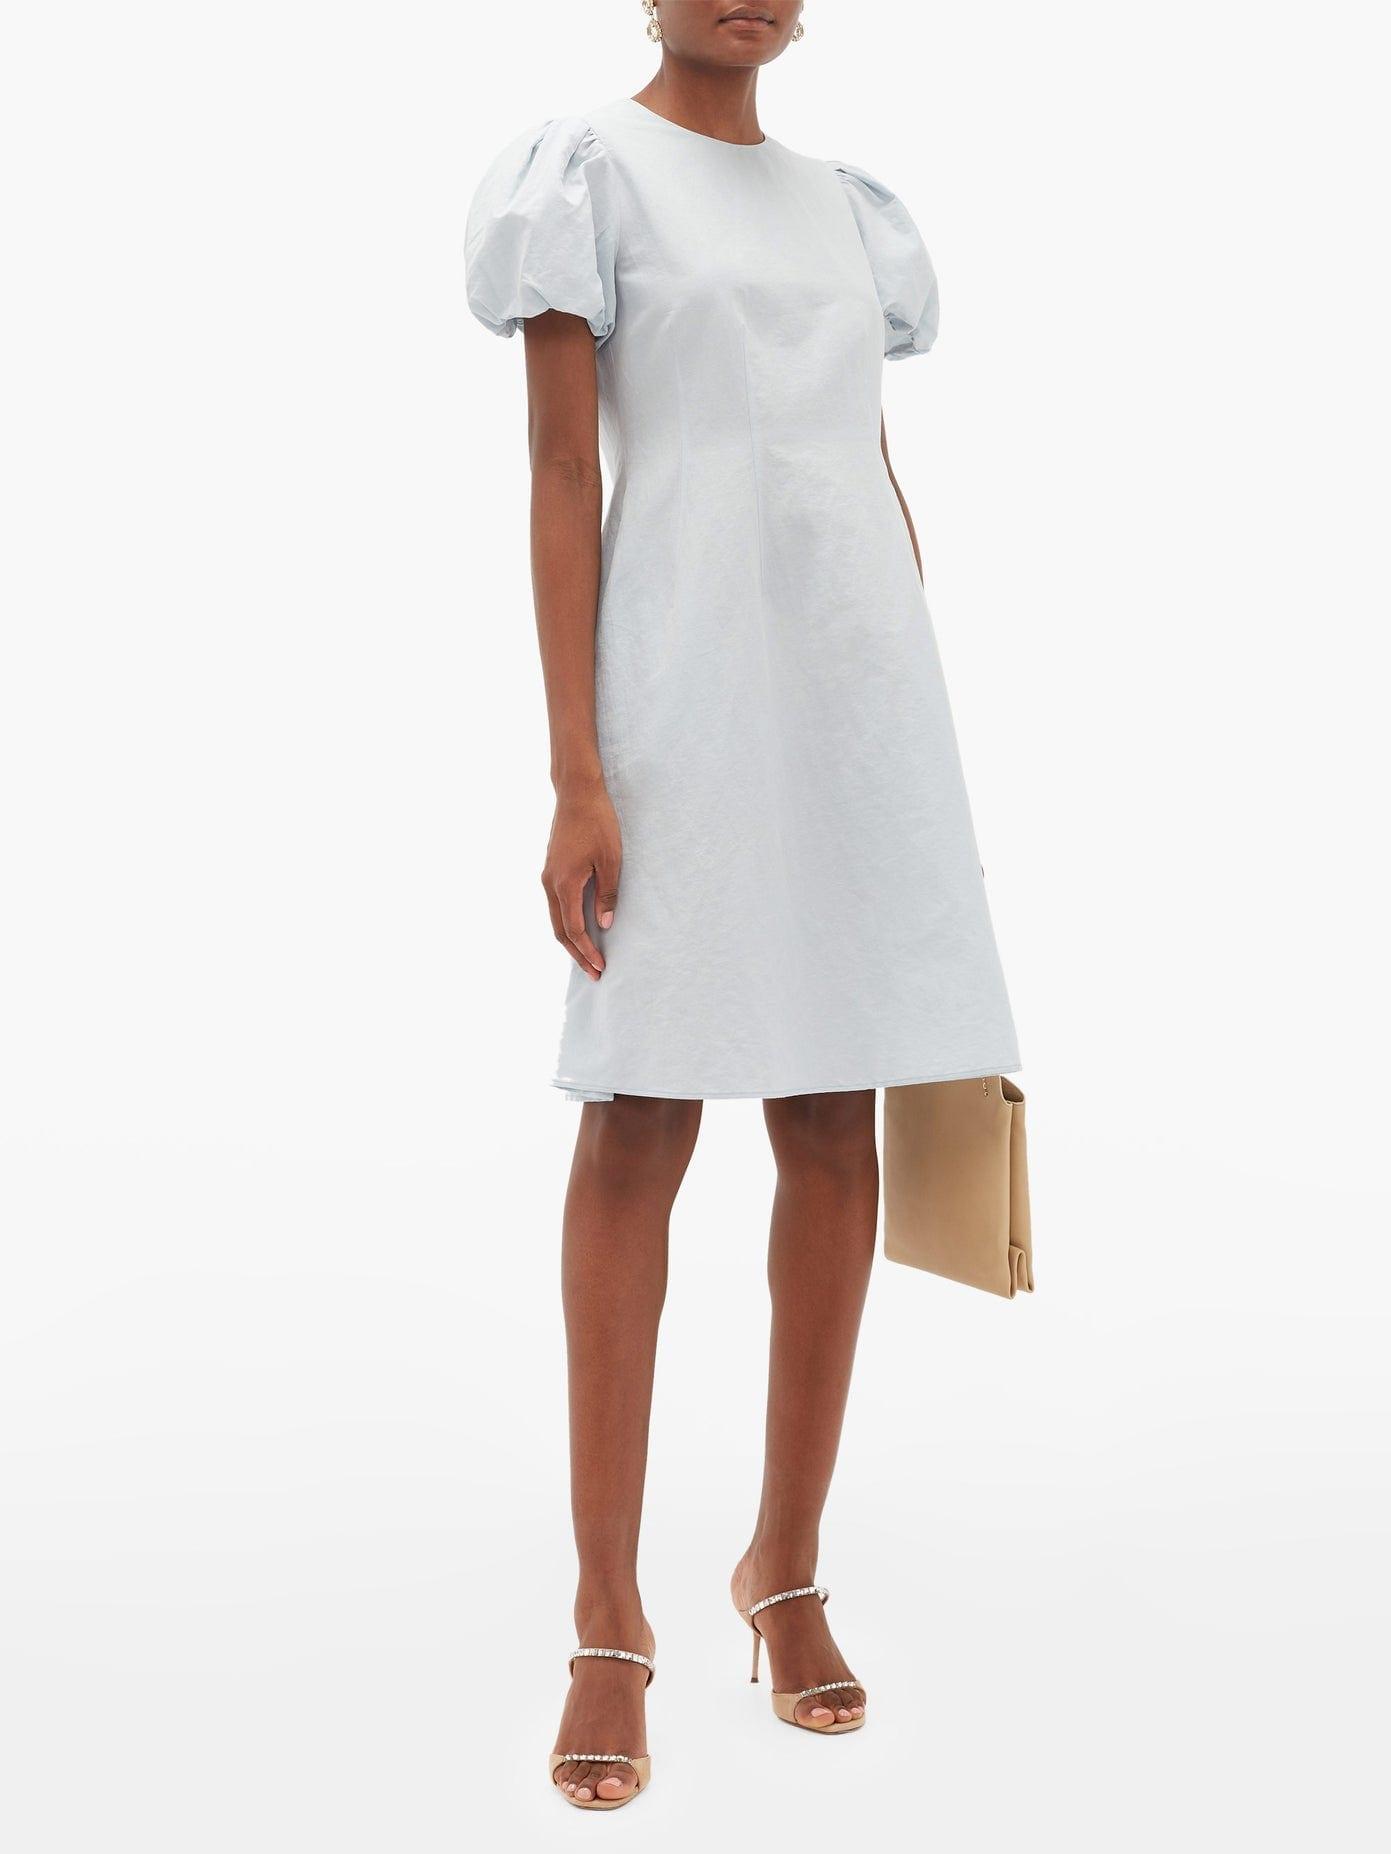 BROCK COLLECTION Puffed-sleeve Cotton-blend Dress